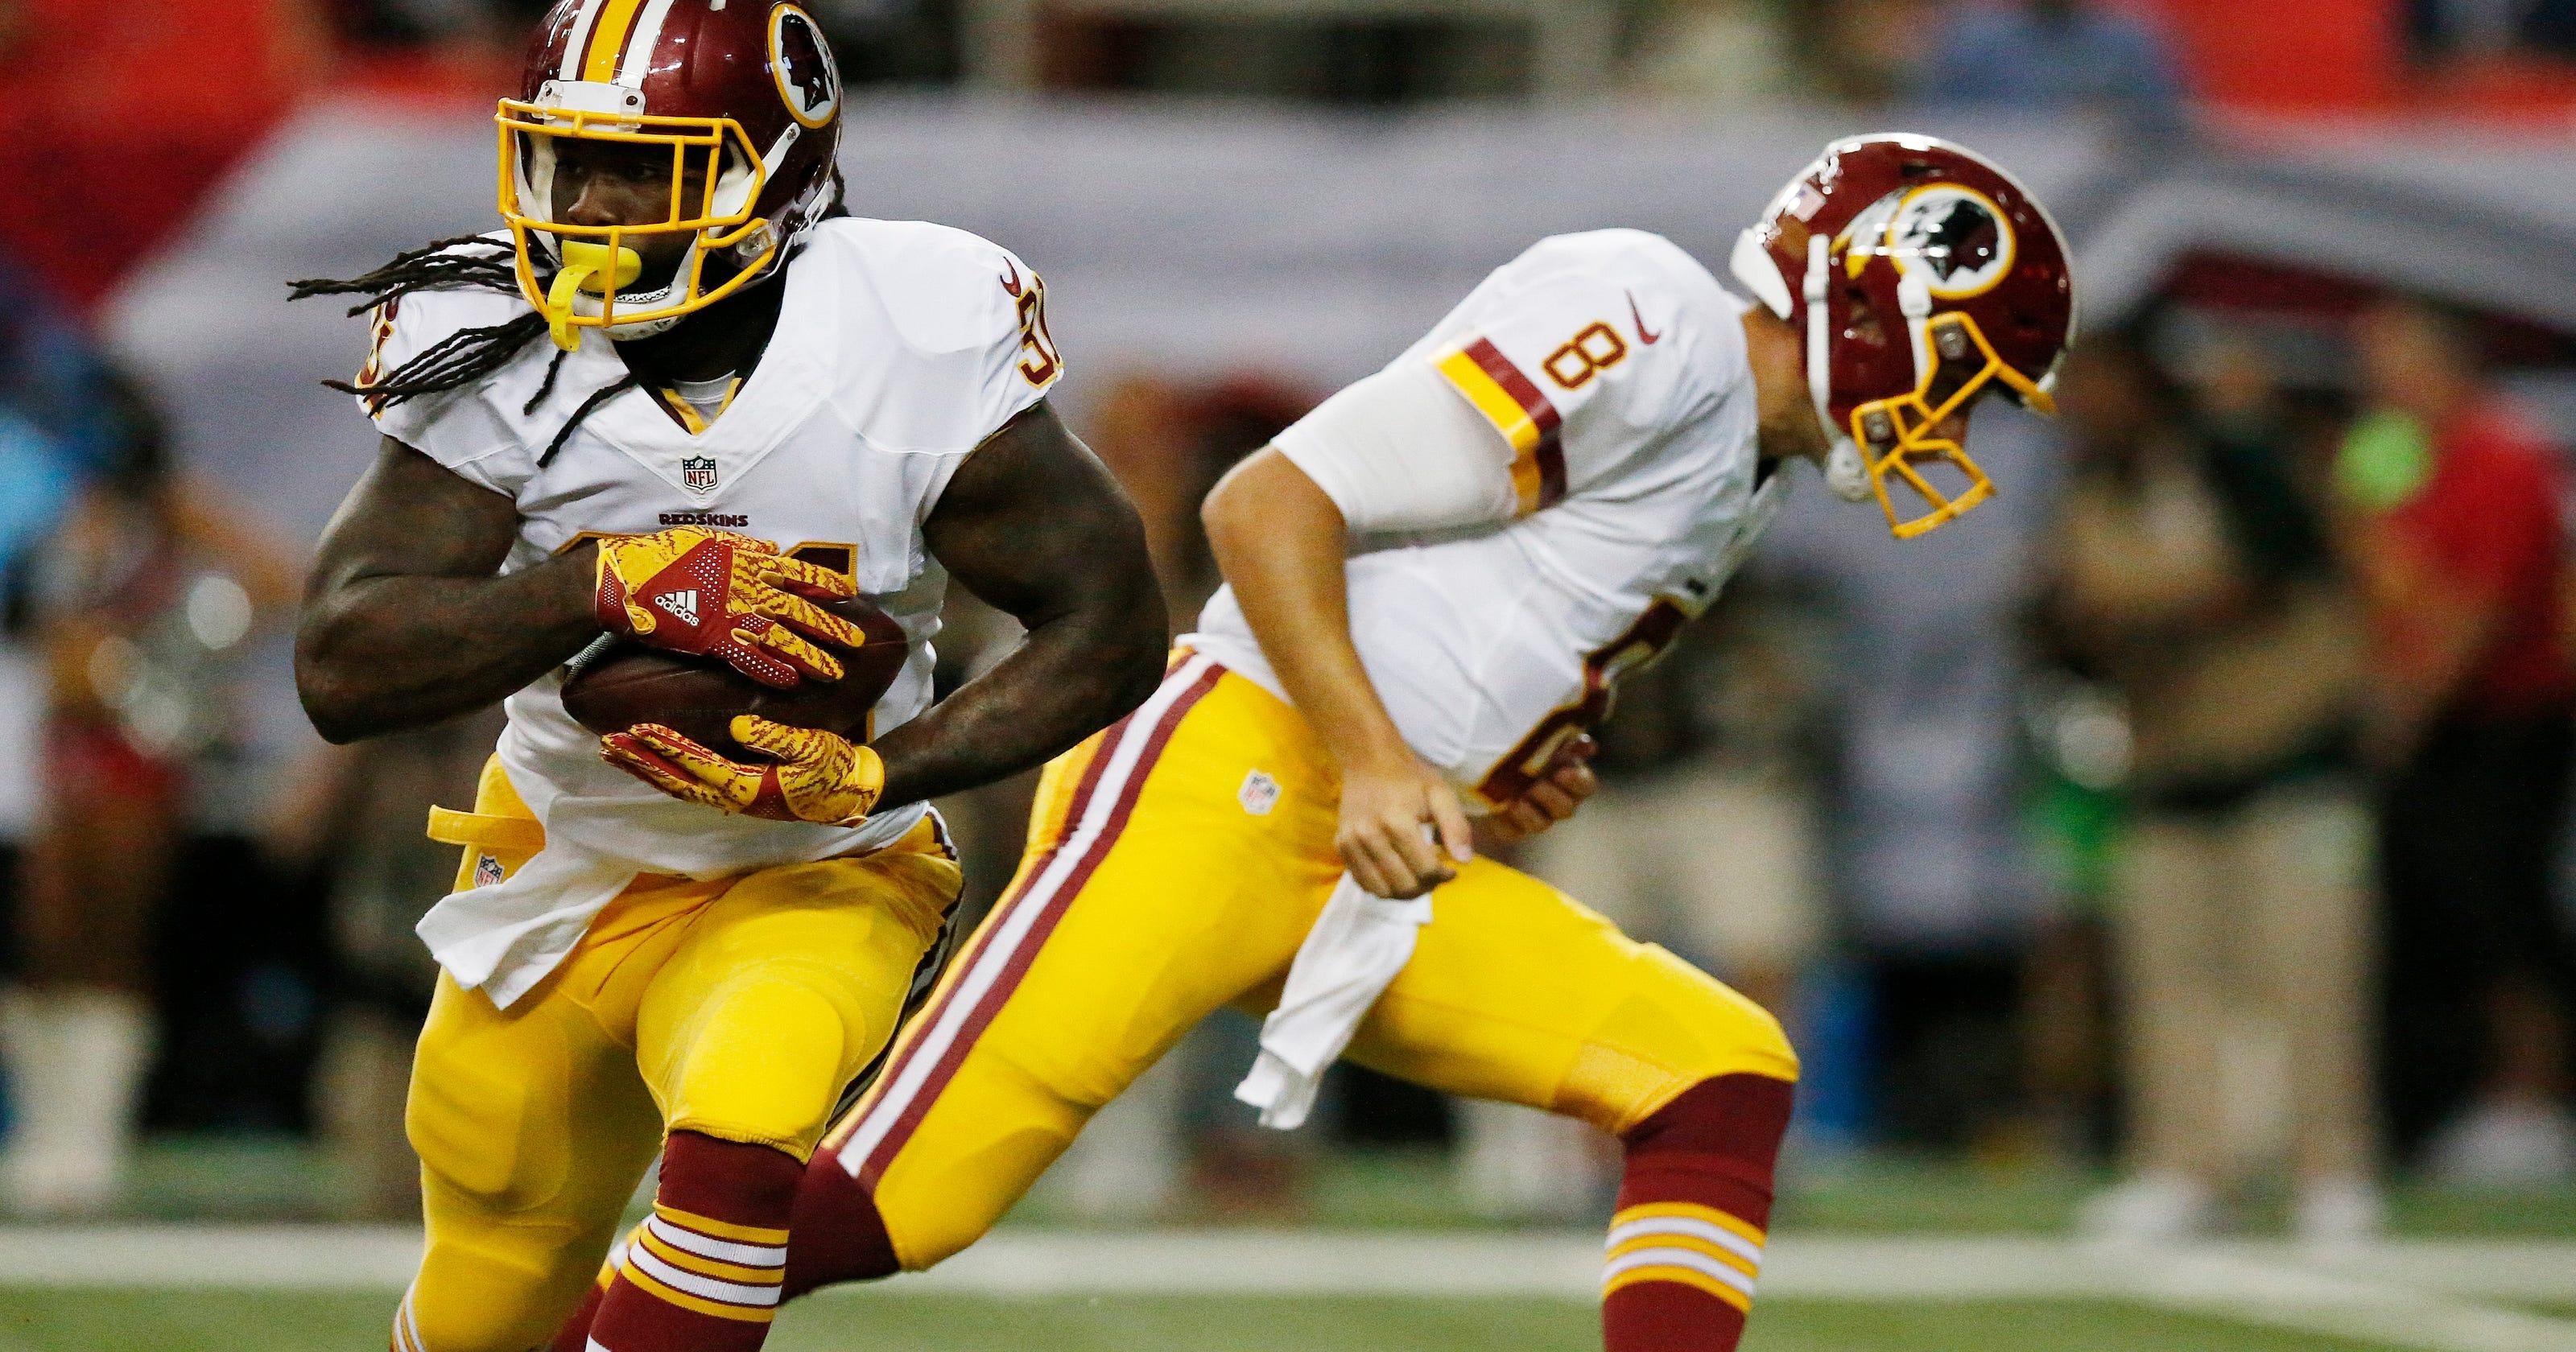 c10b86f7 Redskins RB Matt Jones expects to play vs. Steelers Monday